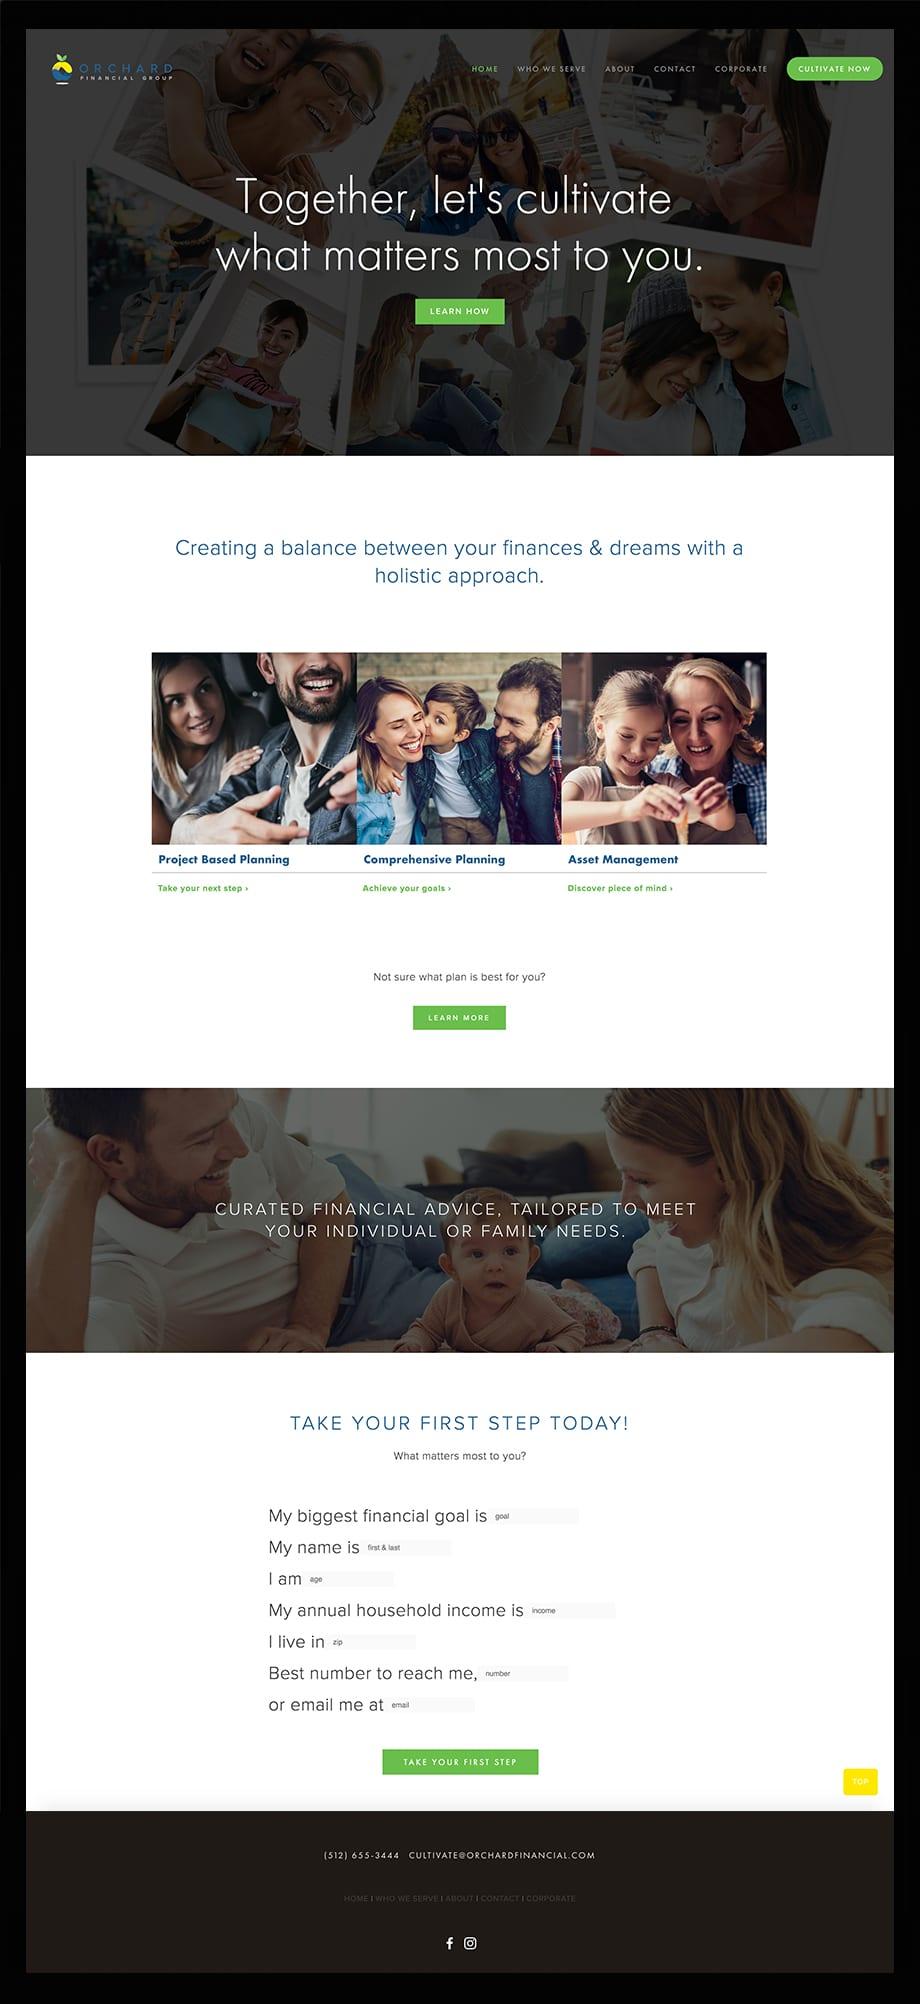 Flaco_Creative_Orchard_Financial_Group_Blog_Website_Home_Design.jpg